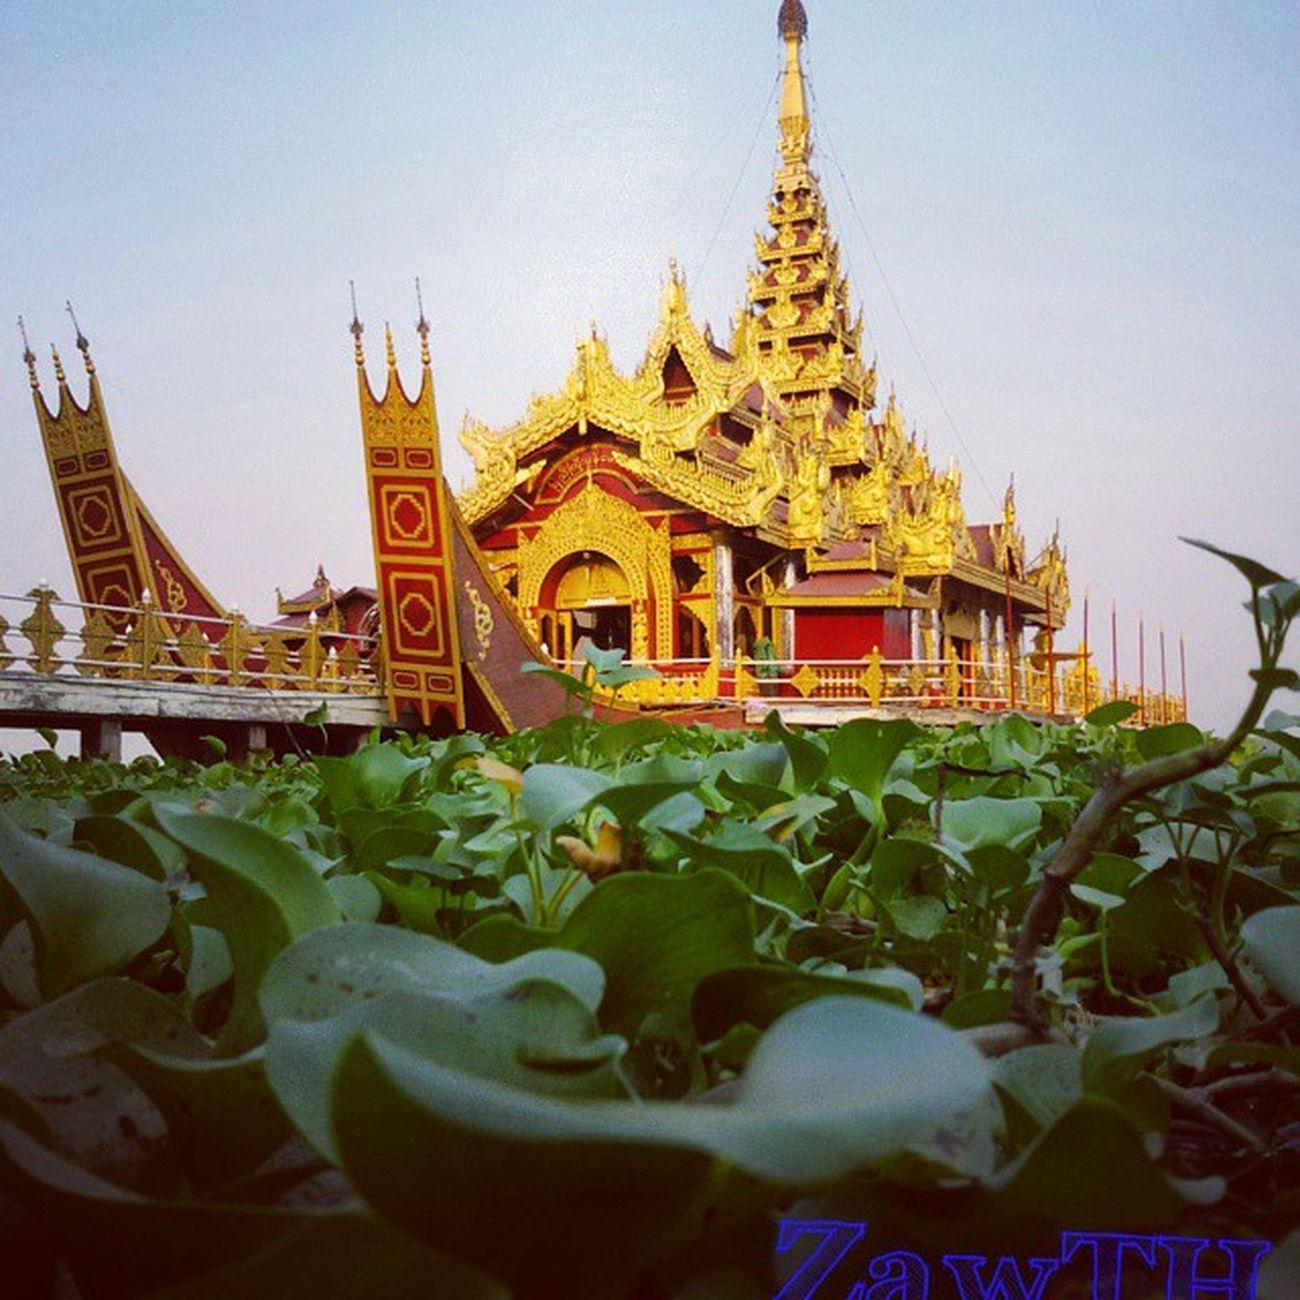 The Pyi-Gyi-Mom Royal Barge. Pyi Gyi Mon Phaung Daw. ျပည္ႀကီးမြန္ ေဖာင္ေတာ္ Royalboat Royalbarge Mandalay Kandawgyi Duckeyeview Myanmar Myanmarphotos Vscomyanmar Igers Igersmandalay Igersmyanmar Zawth Igglobal Rcnocrop